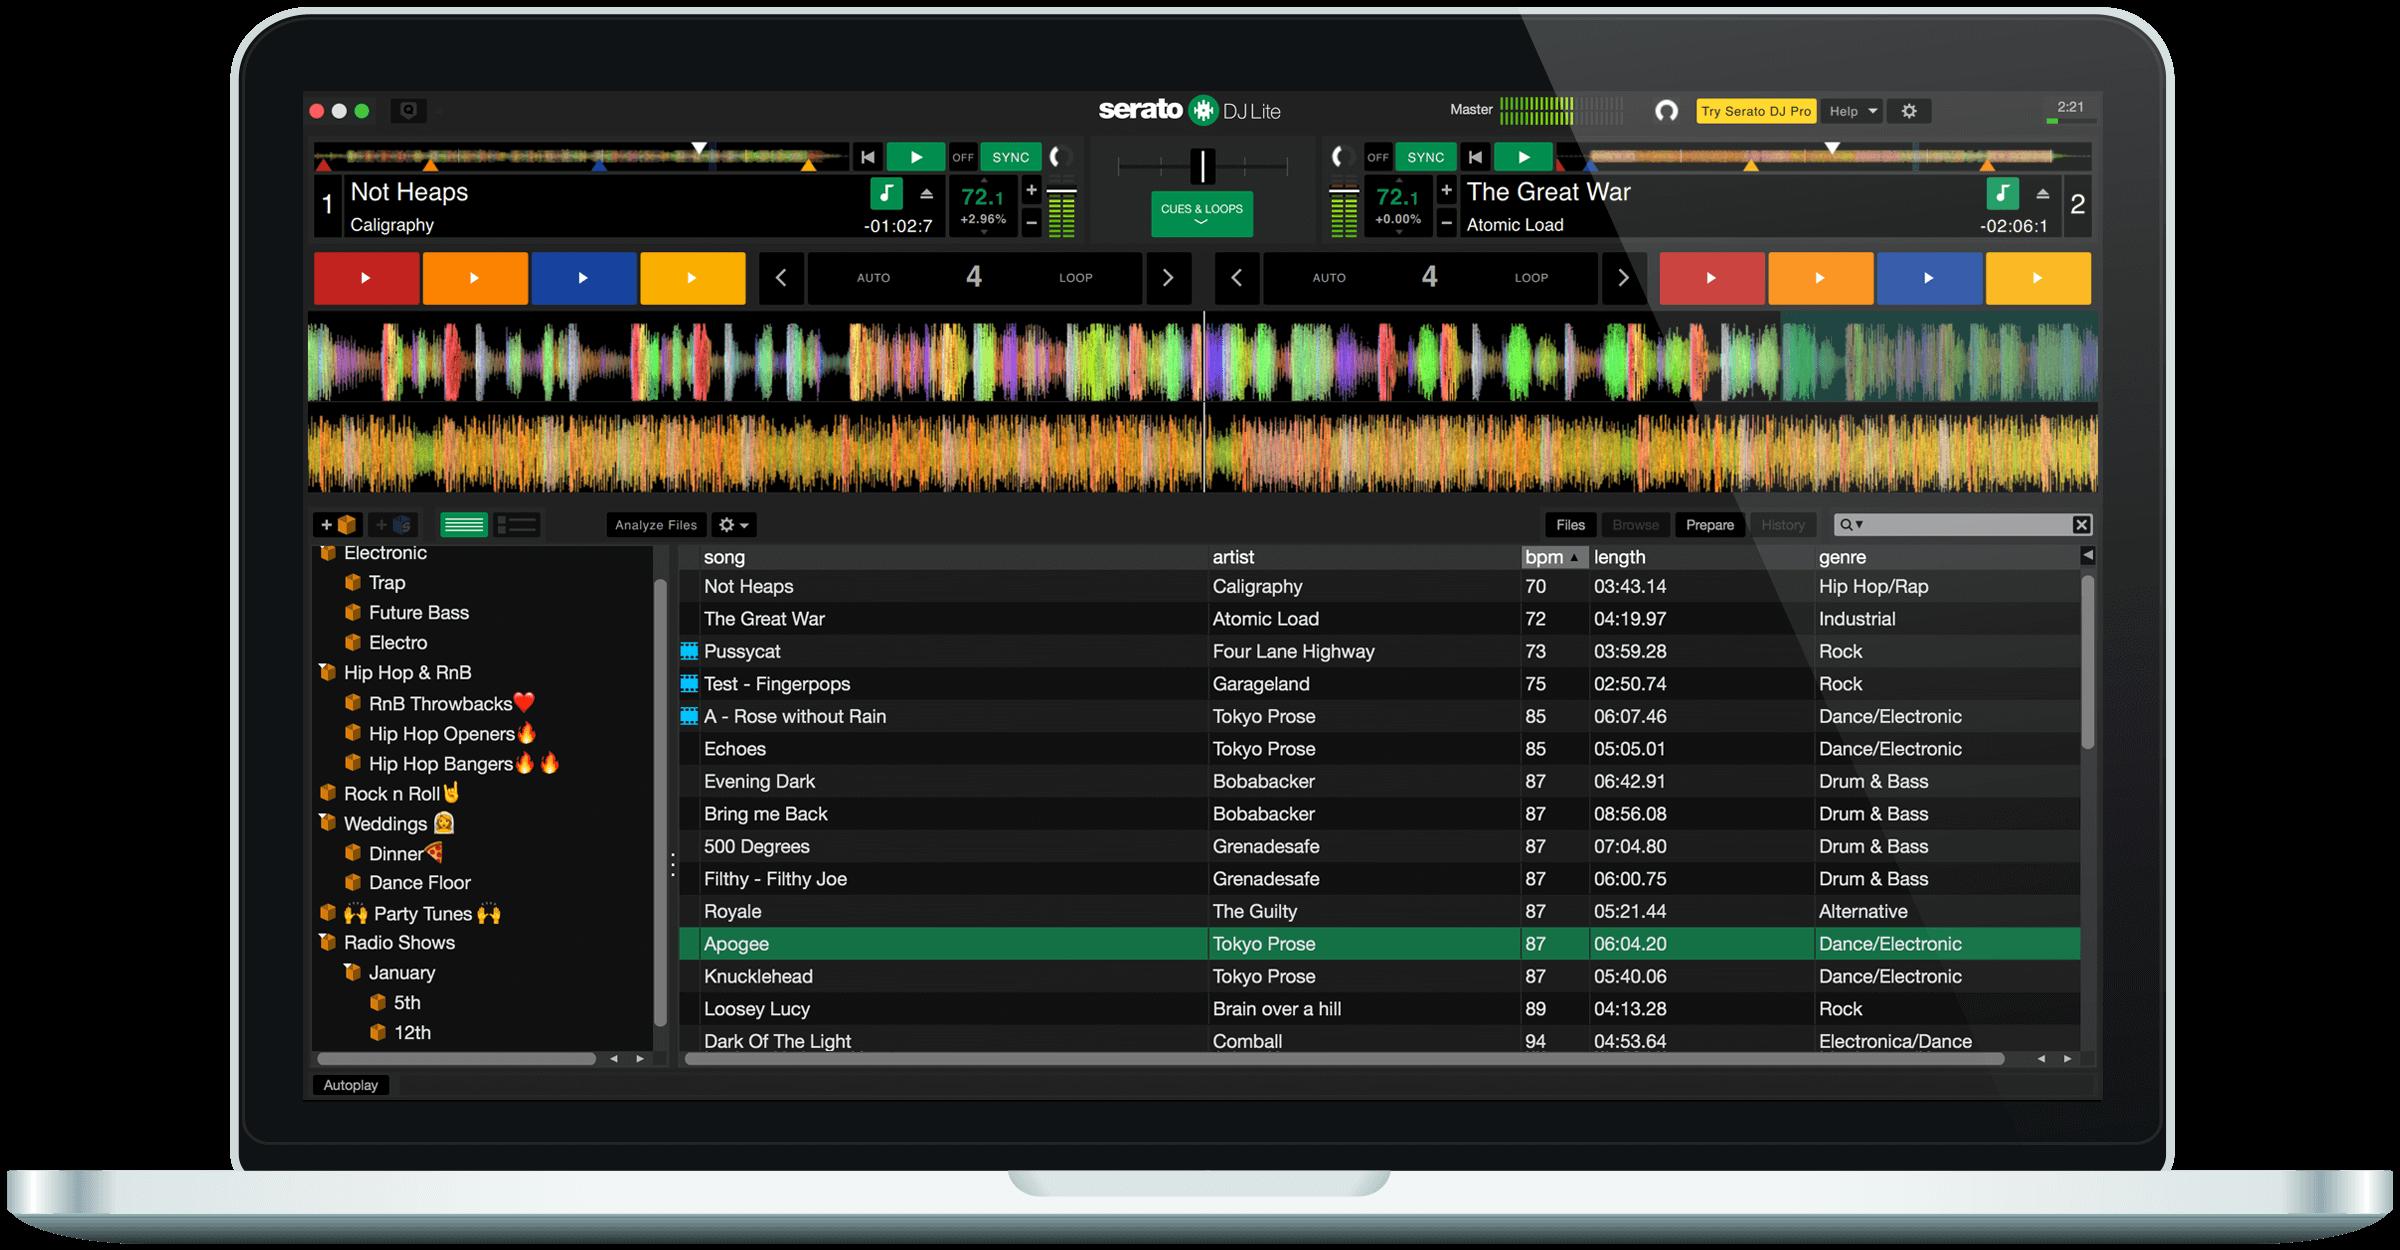 Serato DJ Lite practice mode GUI